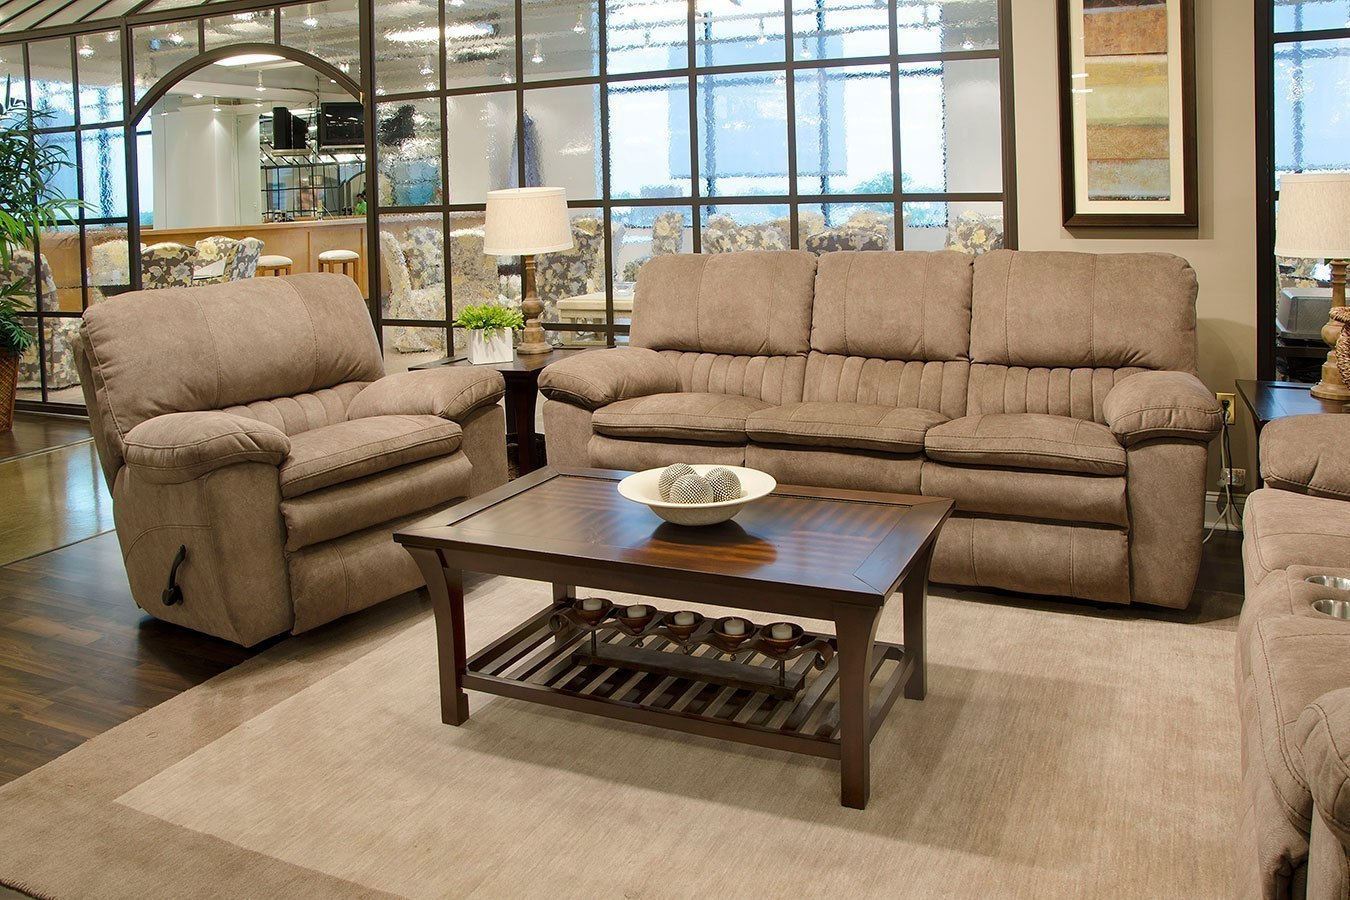 Reyes Power Lay Flat Reclining Living Room Set Portabella